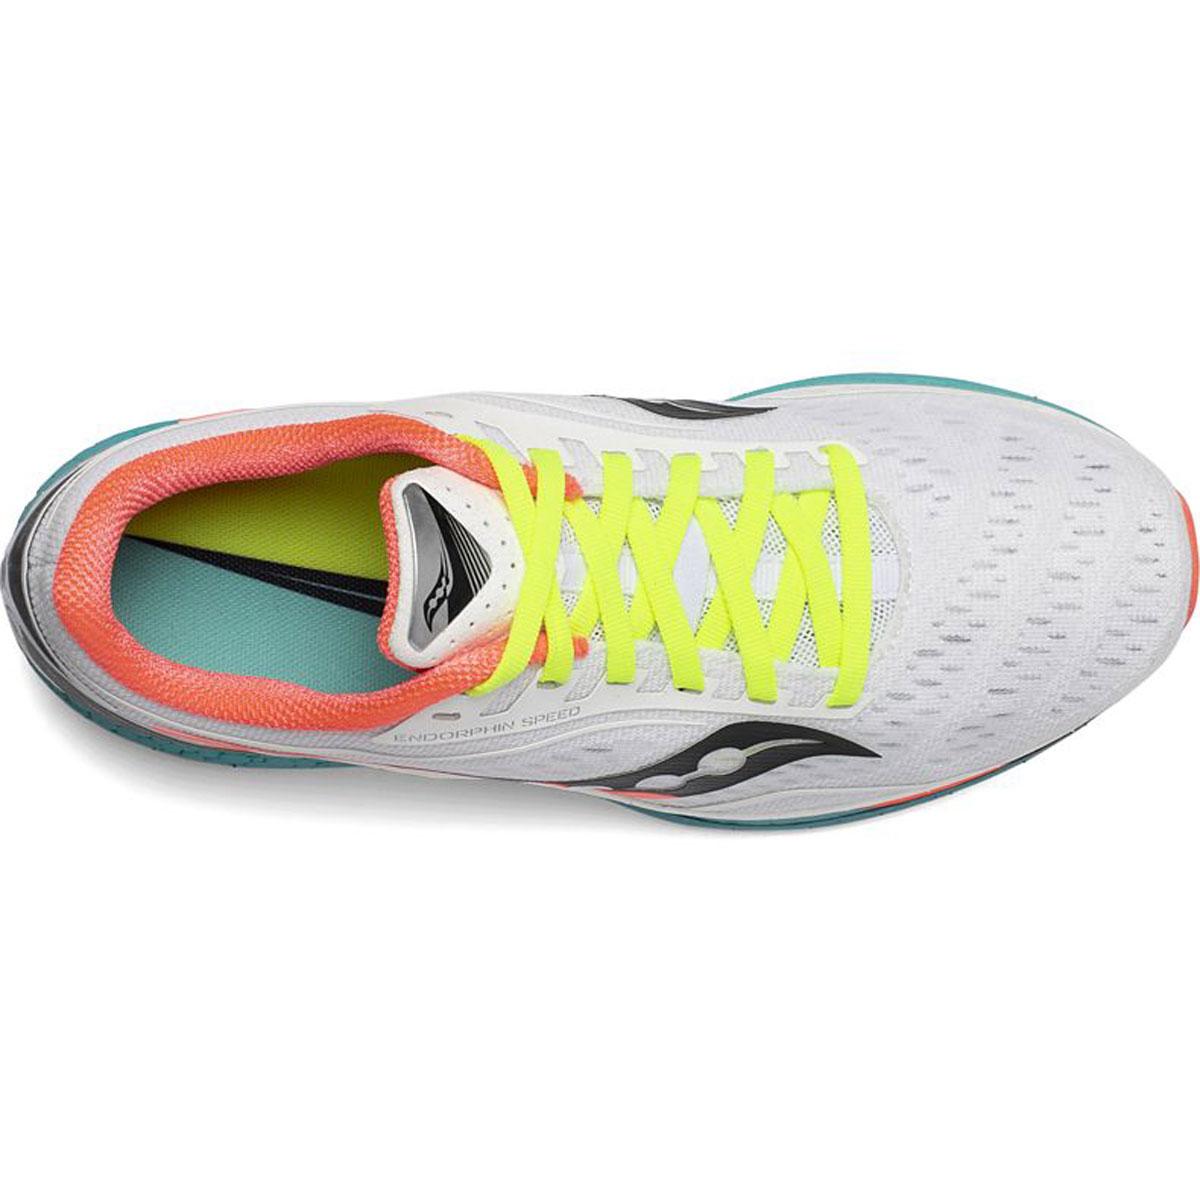 Women's Saucony Endorphin Speed Running Shoe - Color: Moonrock/Mutant - Size: 5 - Width: Regular, Moonrock/Mutant, large, image 3